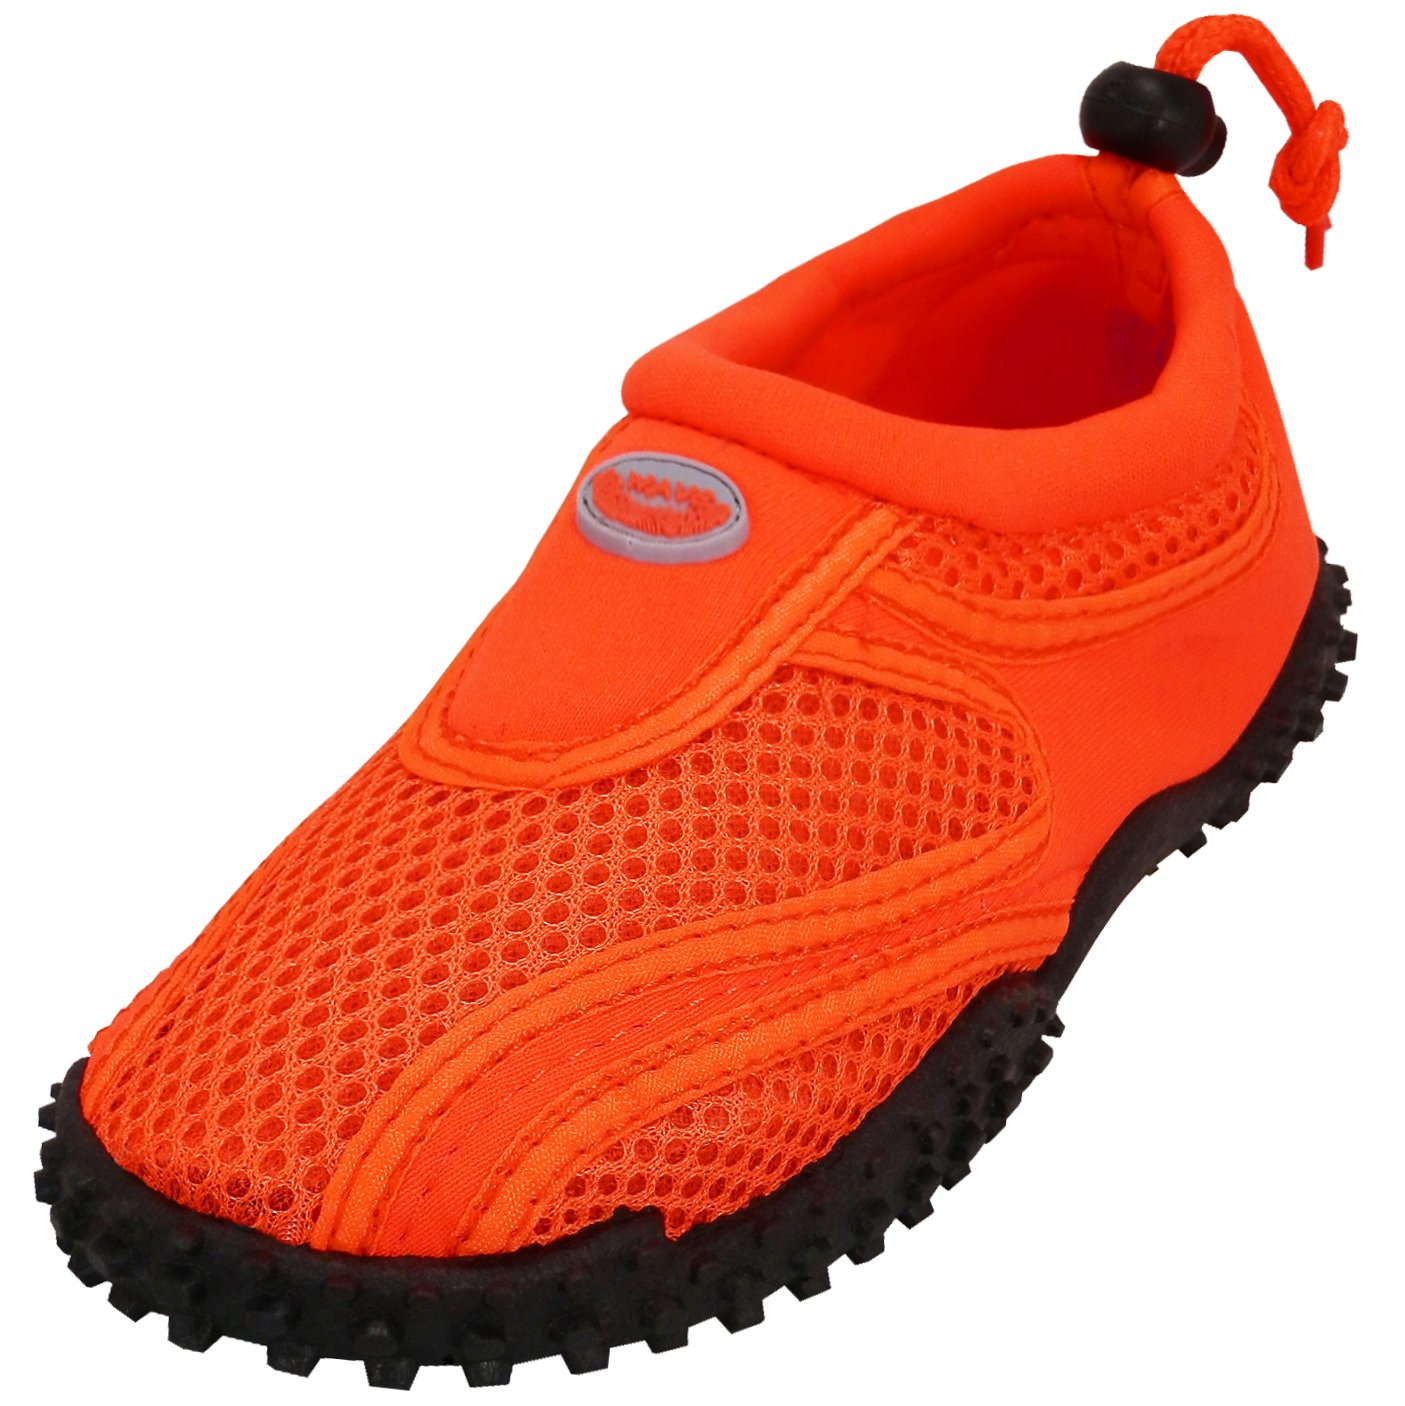 Cambridge Select Kids' Mesh Quick Dry Slip-On Drawstring Non-Slip Water Shoe (Toddler/Little Kid/Big Kid),13 M US Little Kid,Neon Orange